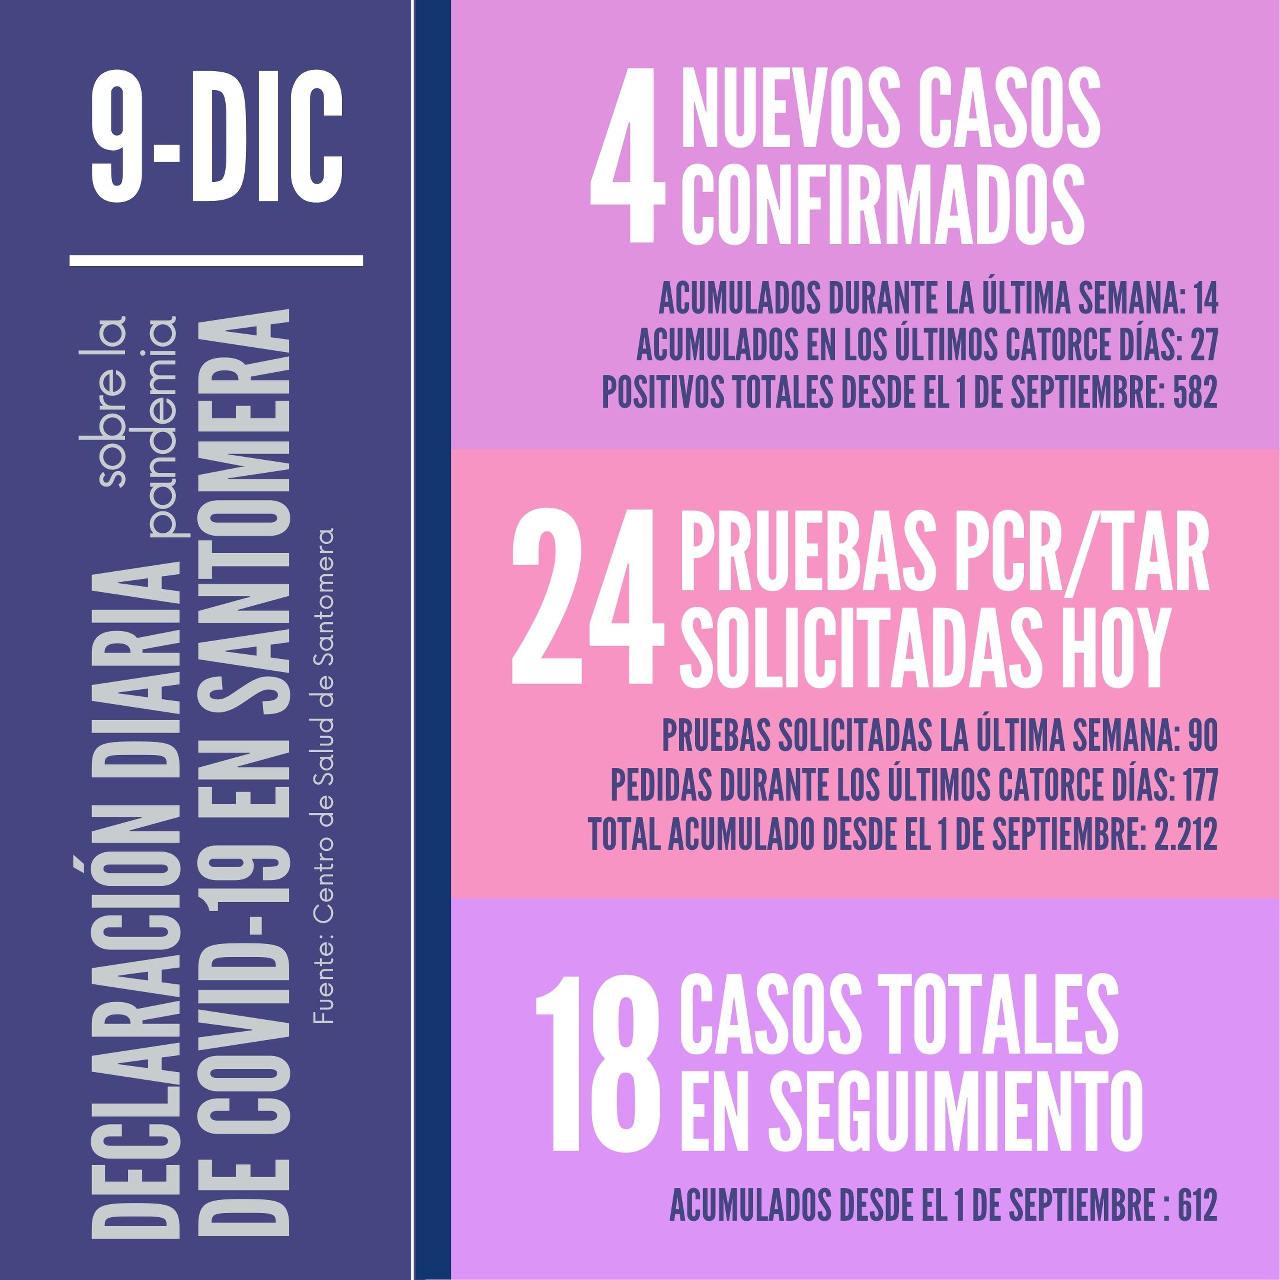 20201209_Datos COVID-19 Santomera